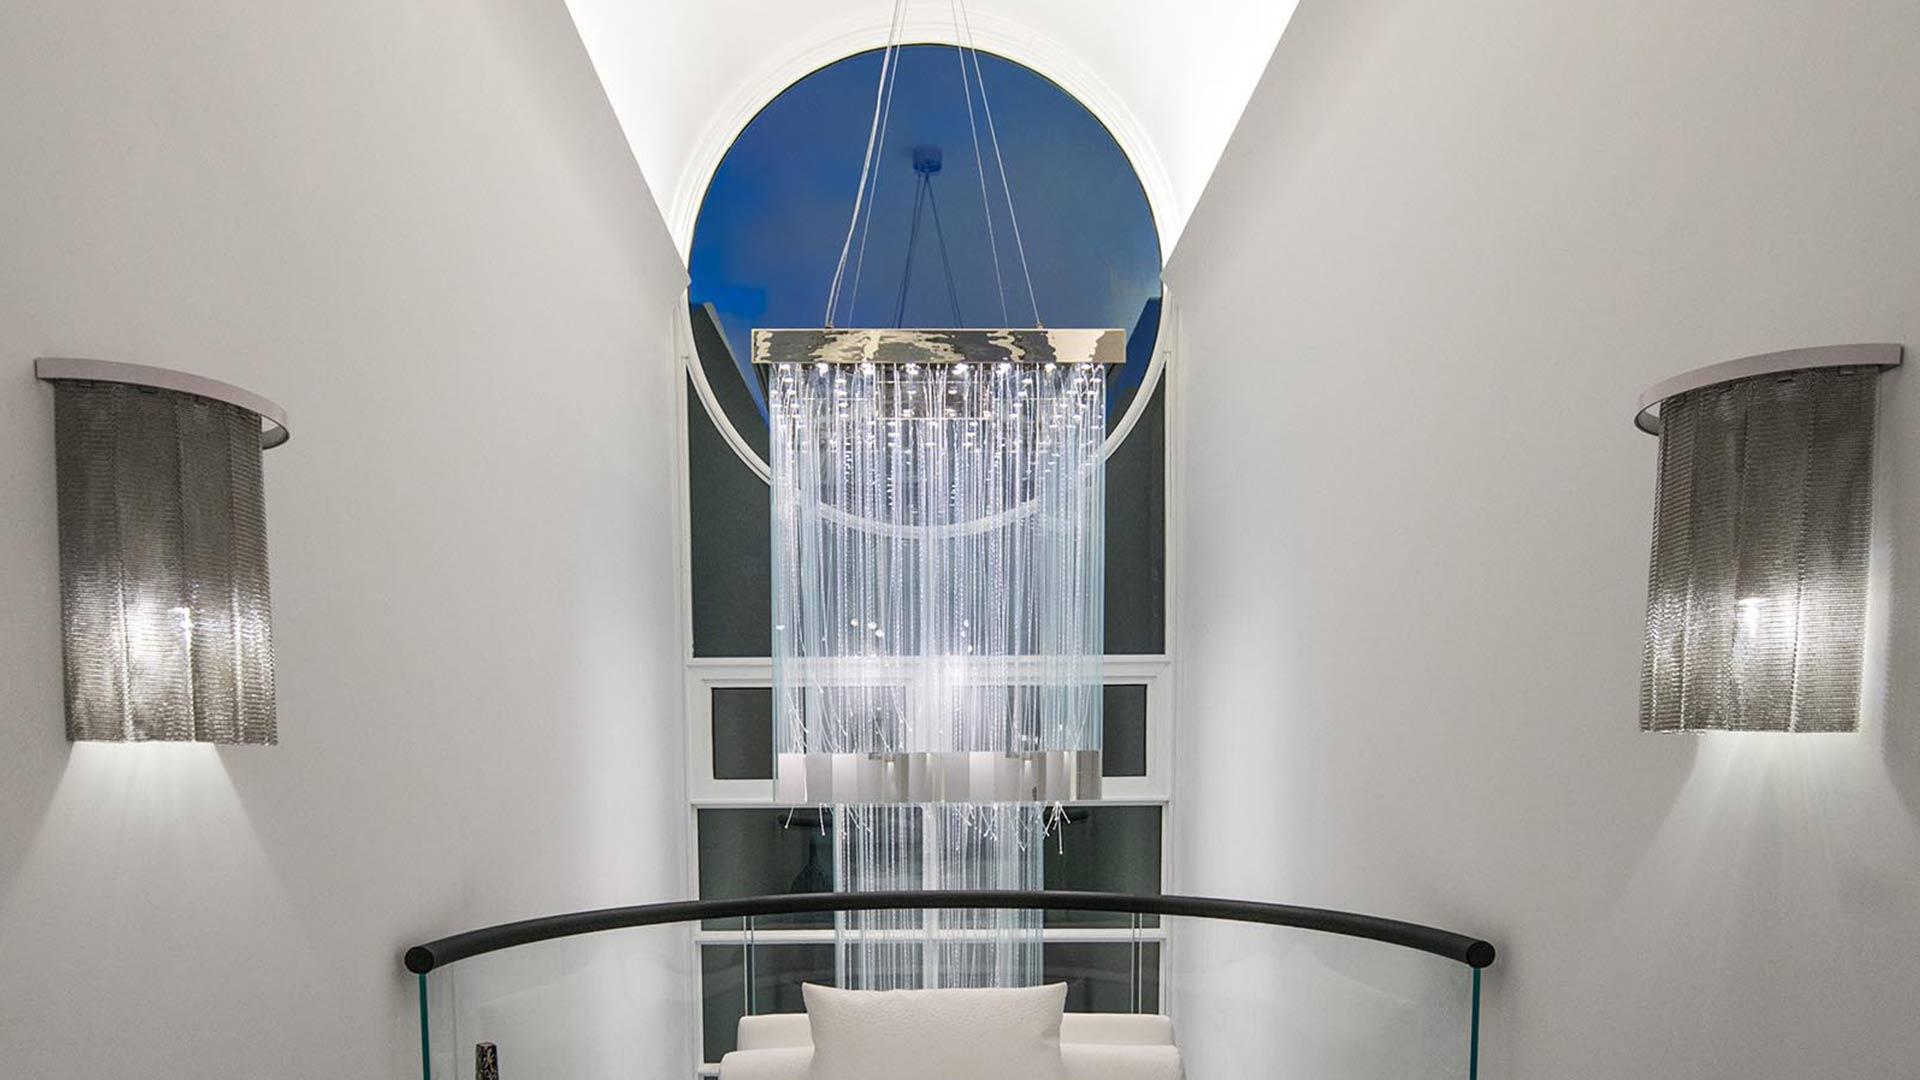 Residential Bespoke Chandelier Barrel Vaulted Ceiling Lighting Design Nulty